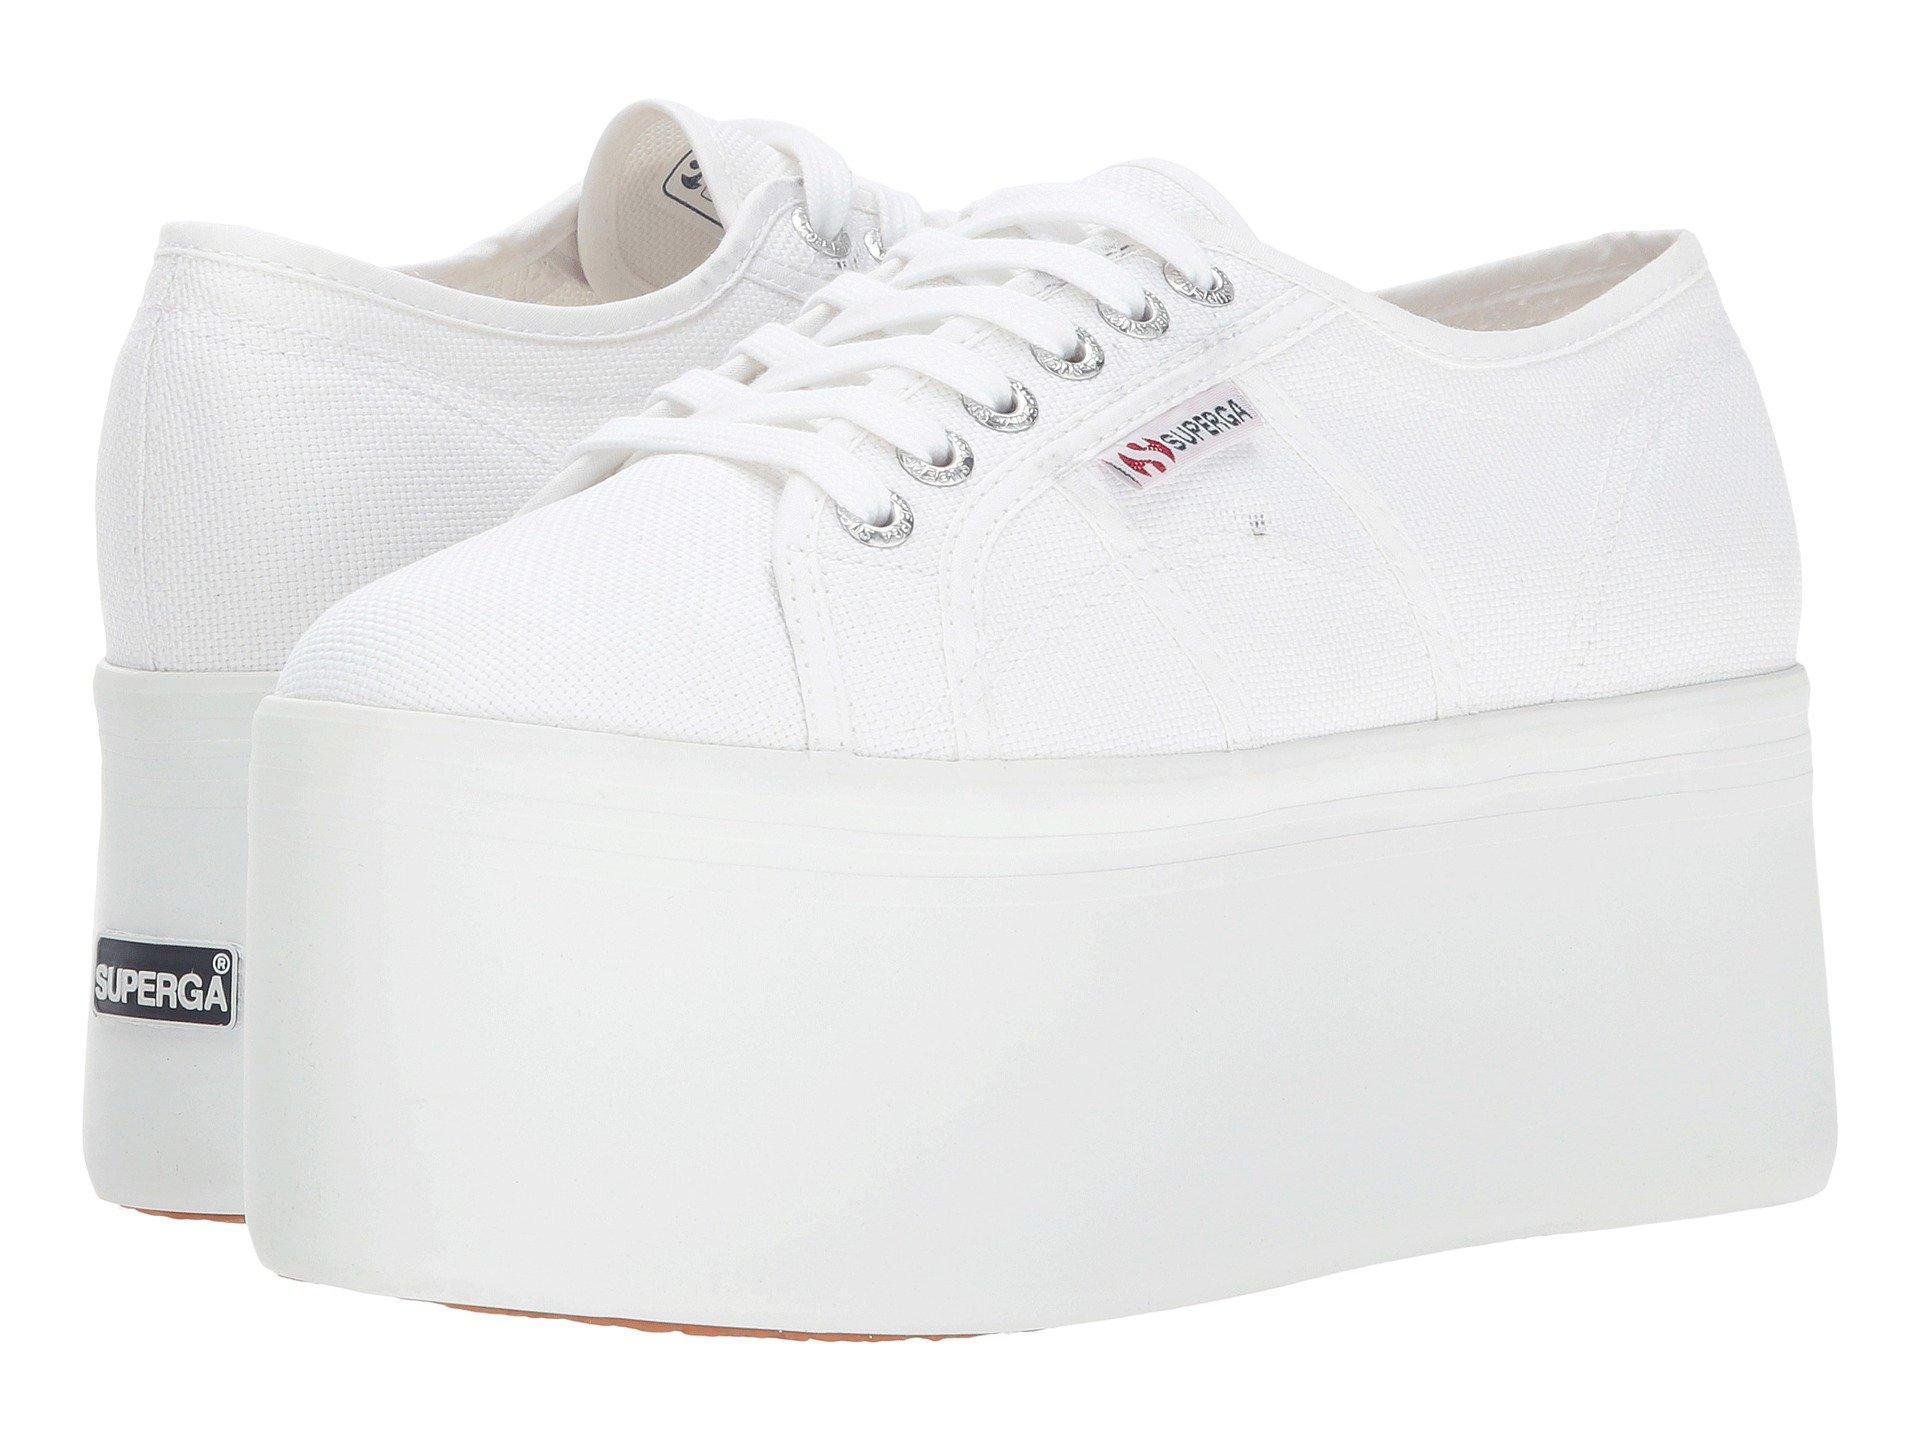 b006d863fe3 Superga 2802 Super Platform In White